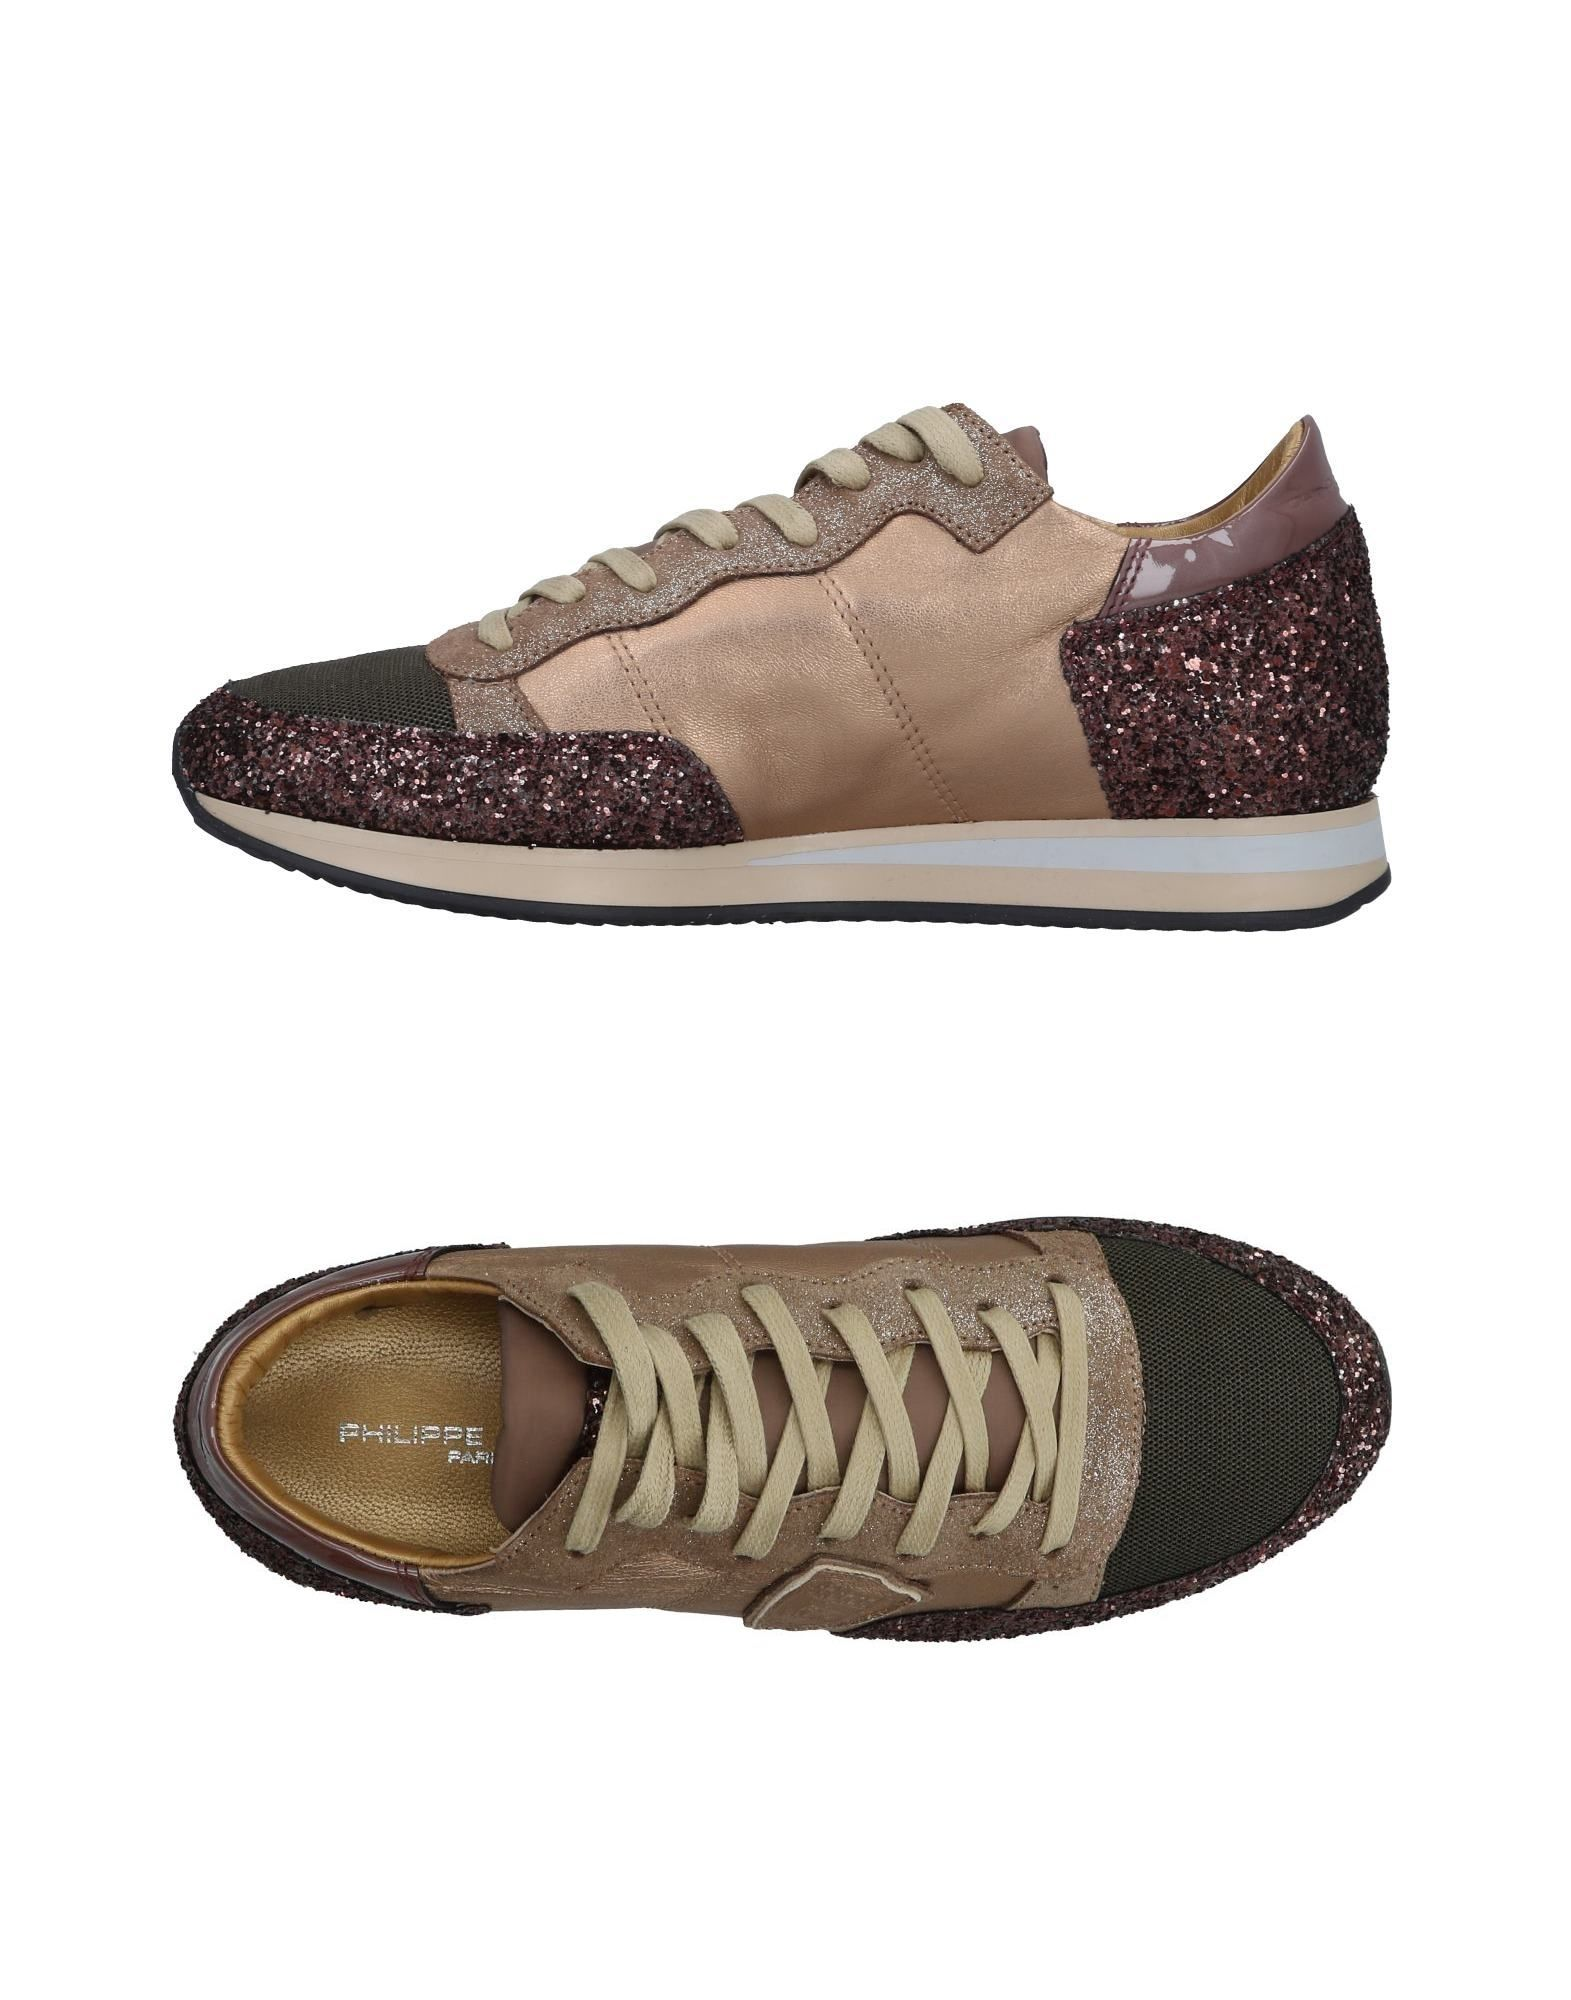 Philippe Model Sneakers Damen  11496292SLGut aussehende strapazierfähige Schuhe